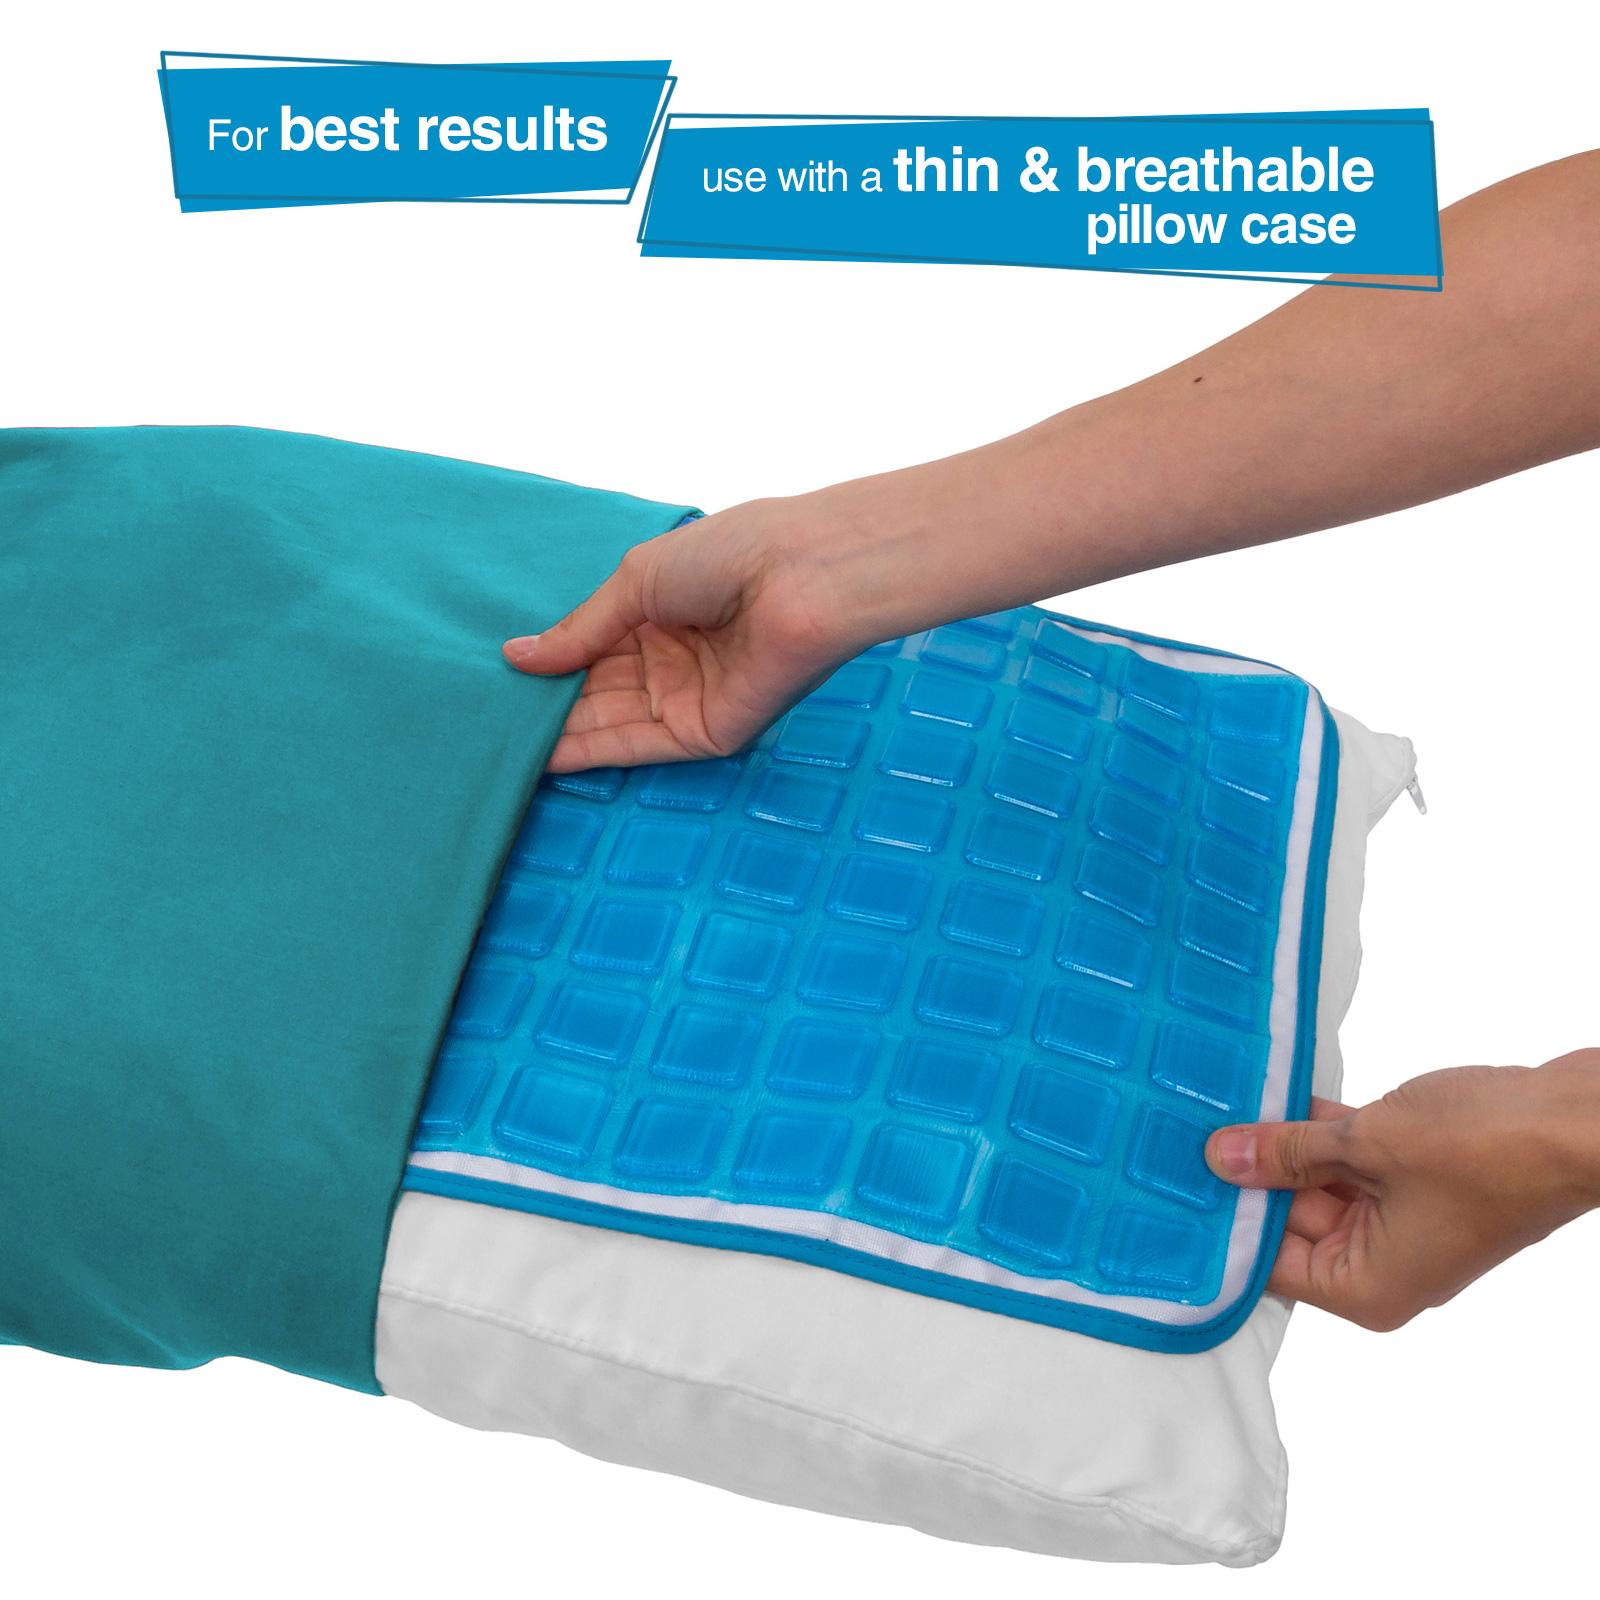 Pillow Gel Cool Mat Sleep Soft Pad Aid Hot Flash Fever Migraine Pain Slumber Pet